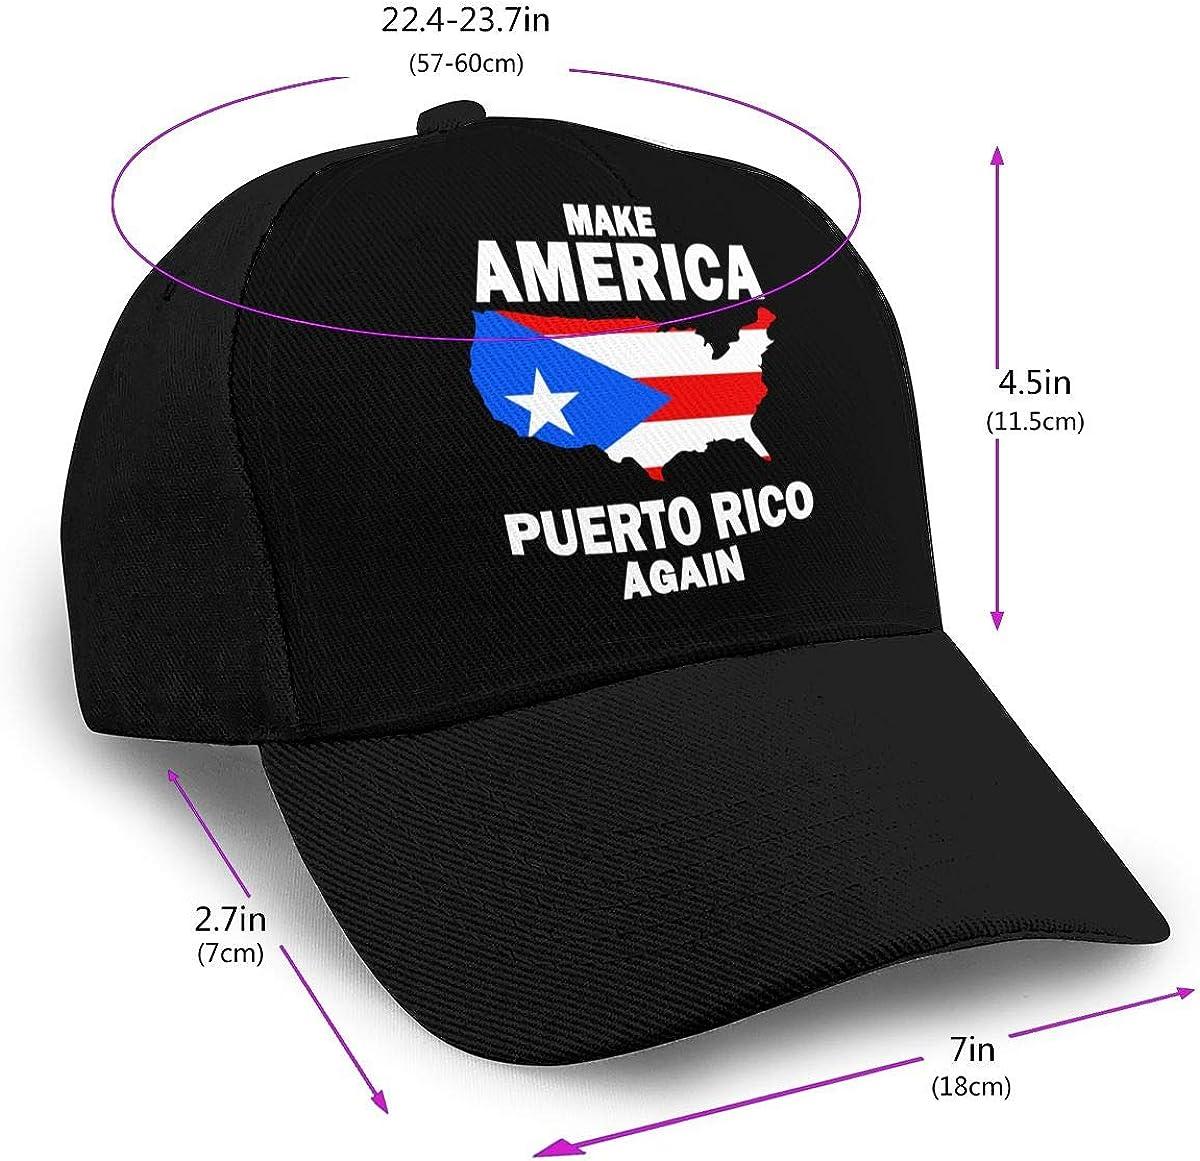 Make America Puerto Rico Again Trucker Hat for Unisex Cotton Snapback Cap